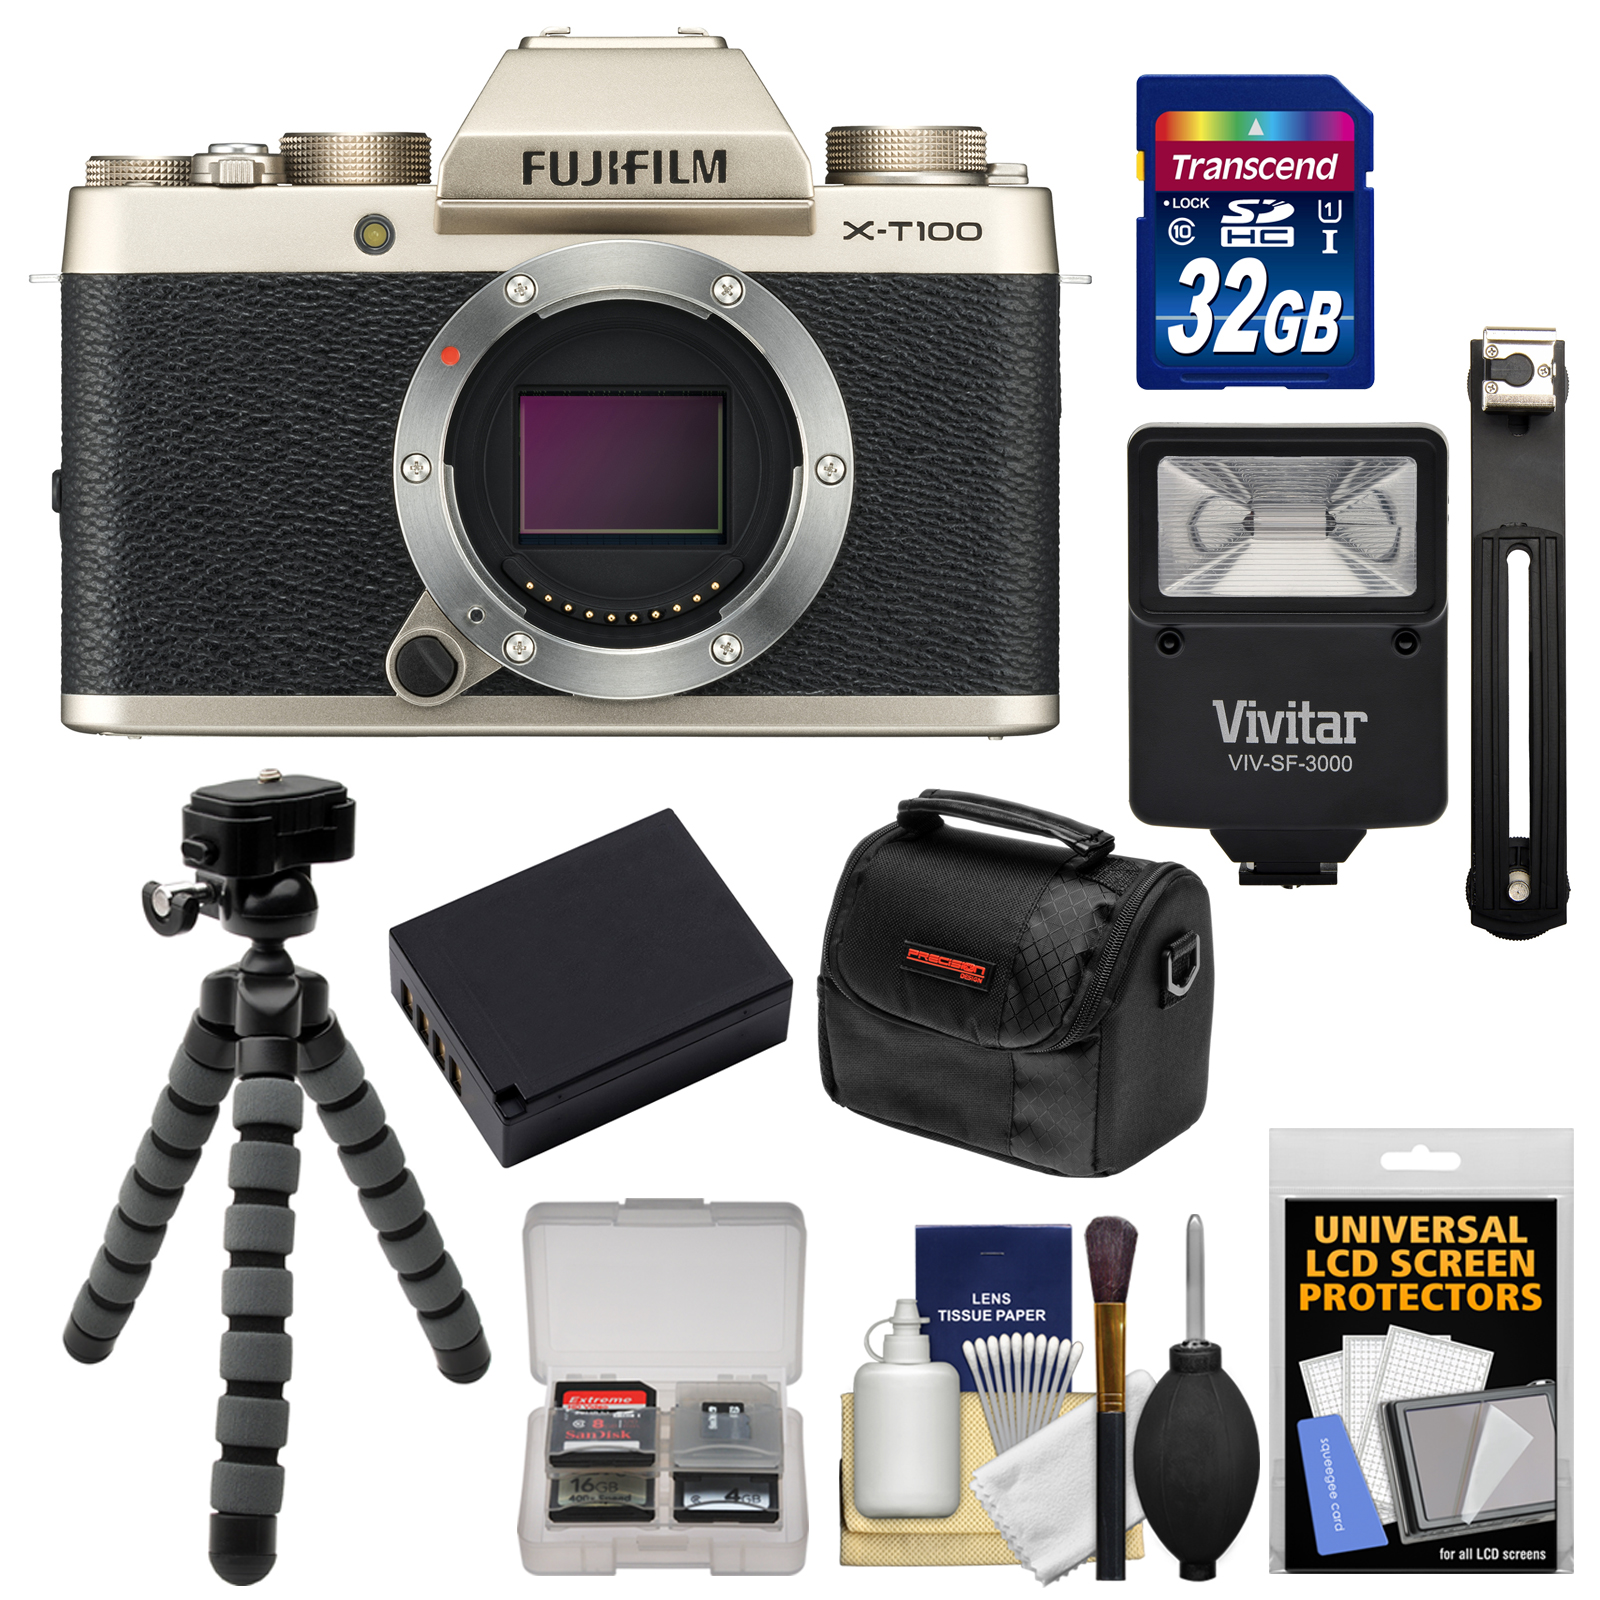 Fujifilm X-T100 Digital Camera Body (Champagne Gold) with 32GB Card + Battery + Tripod + Flash + Case + Kit